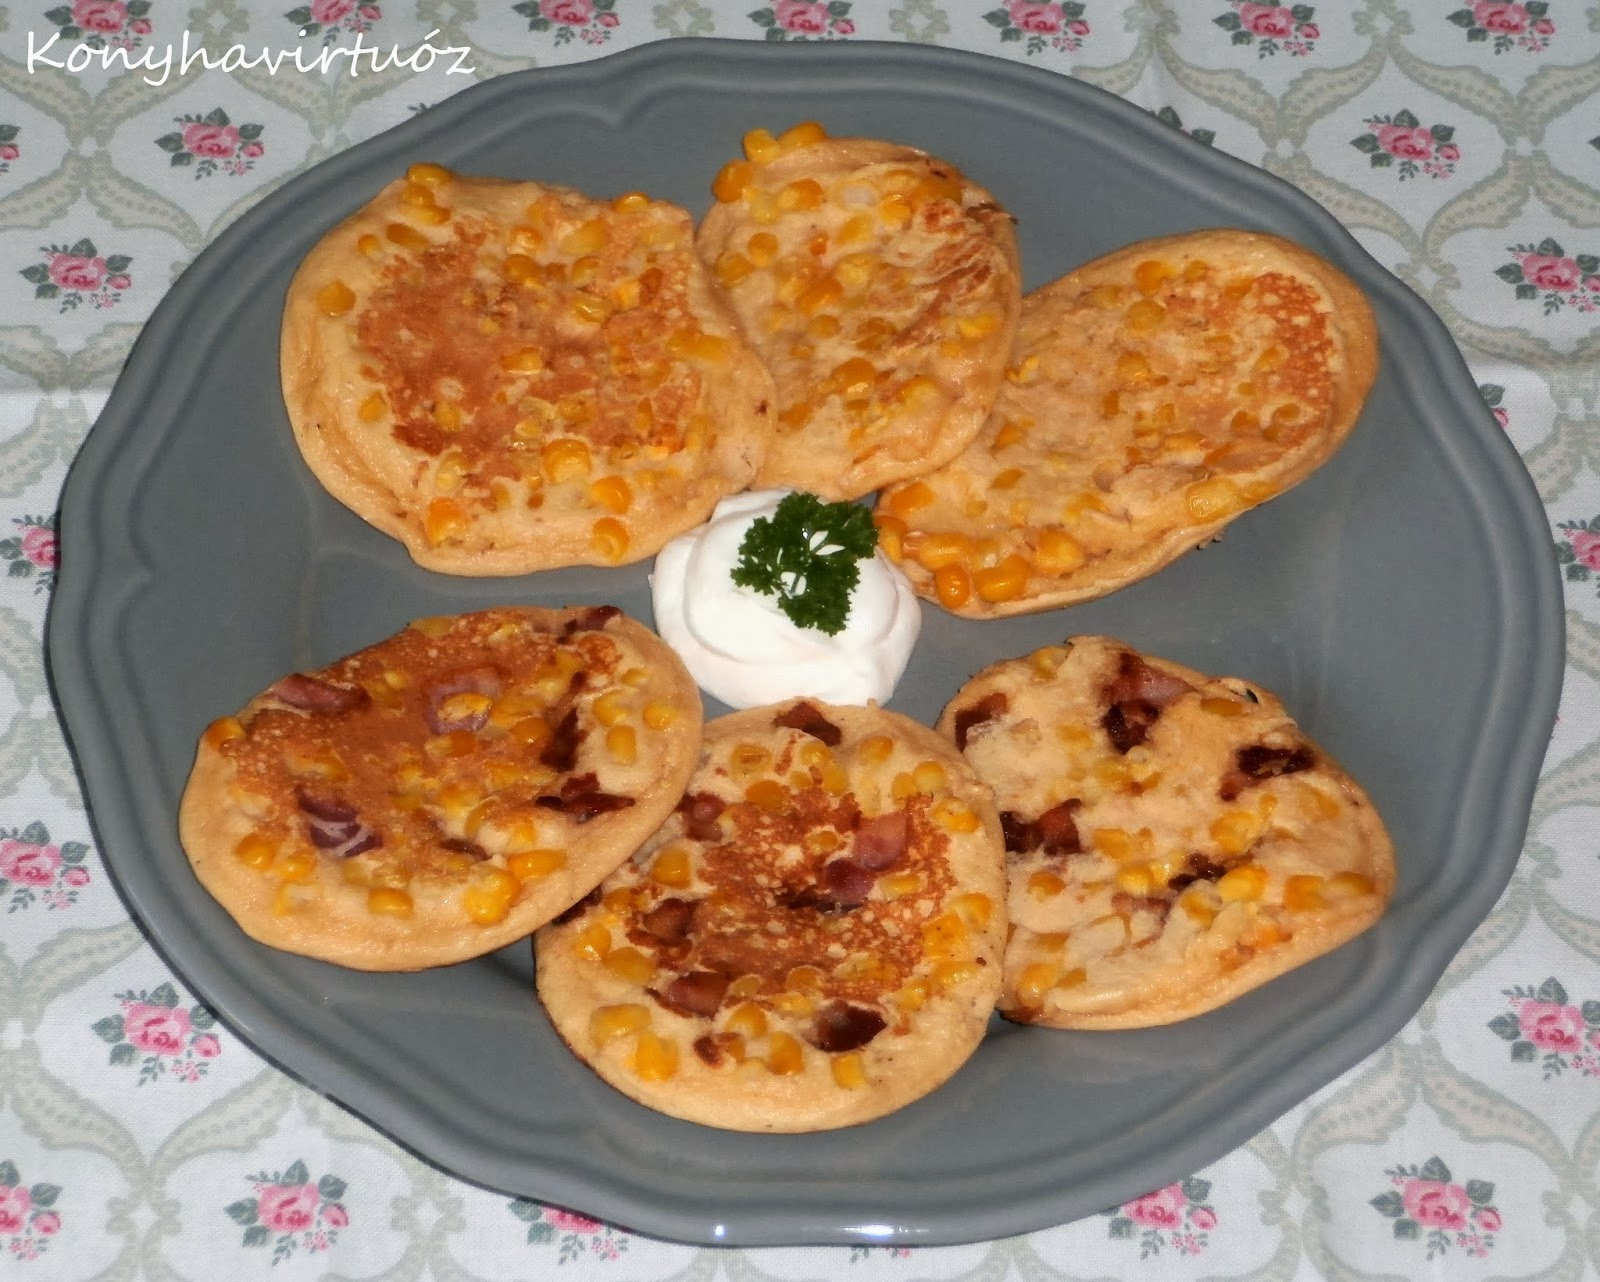 http://konyhavirtuoz.blogspot.hu/2014/03/szalonnas-kukoricas-amerikai-palacsinta.html